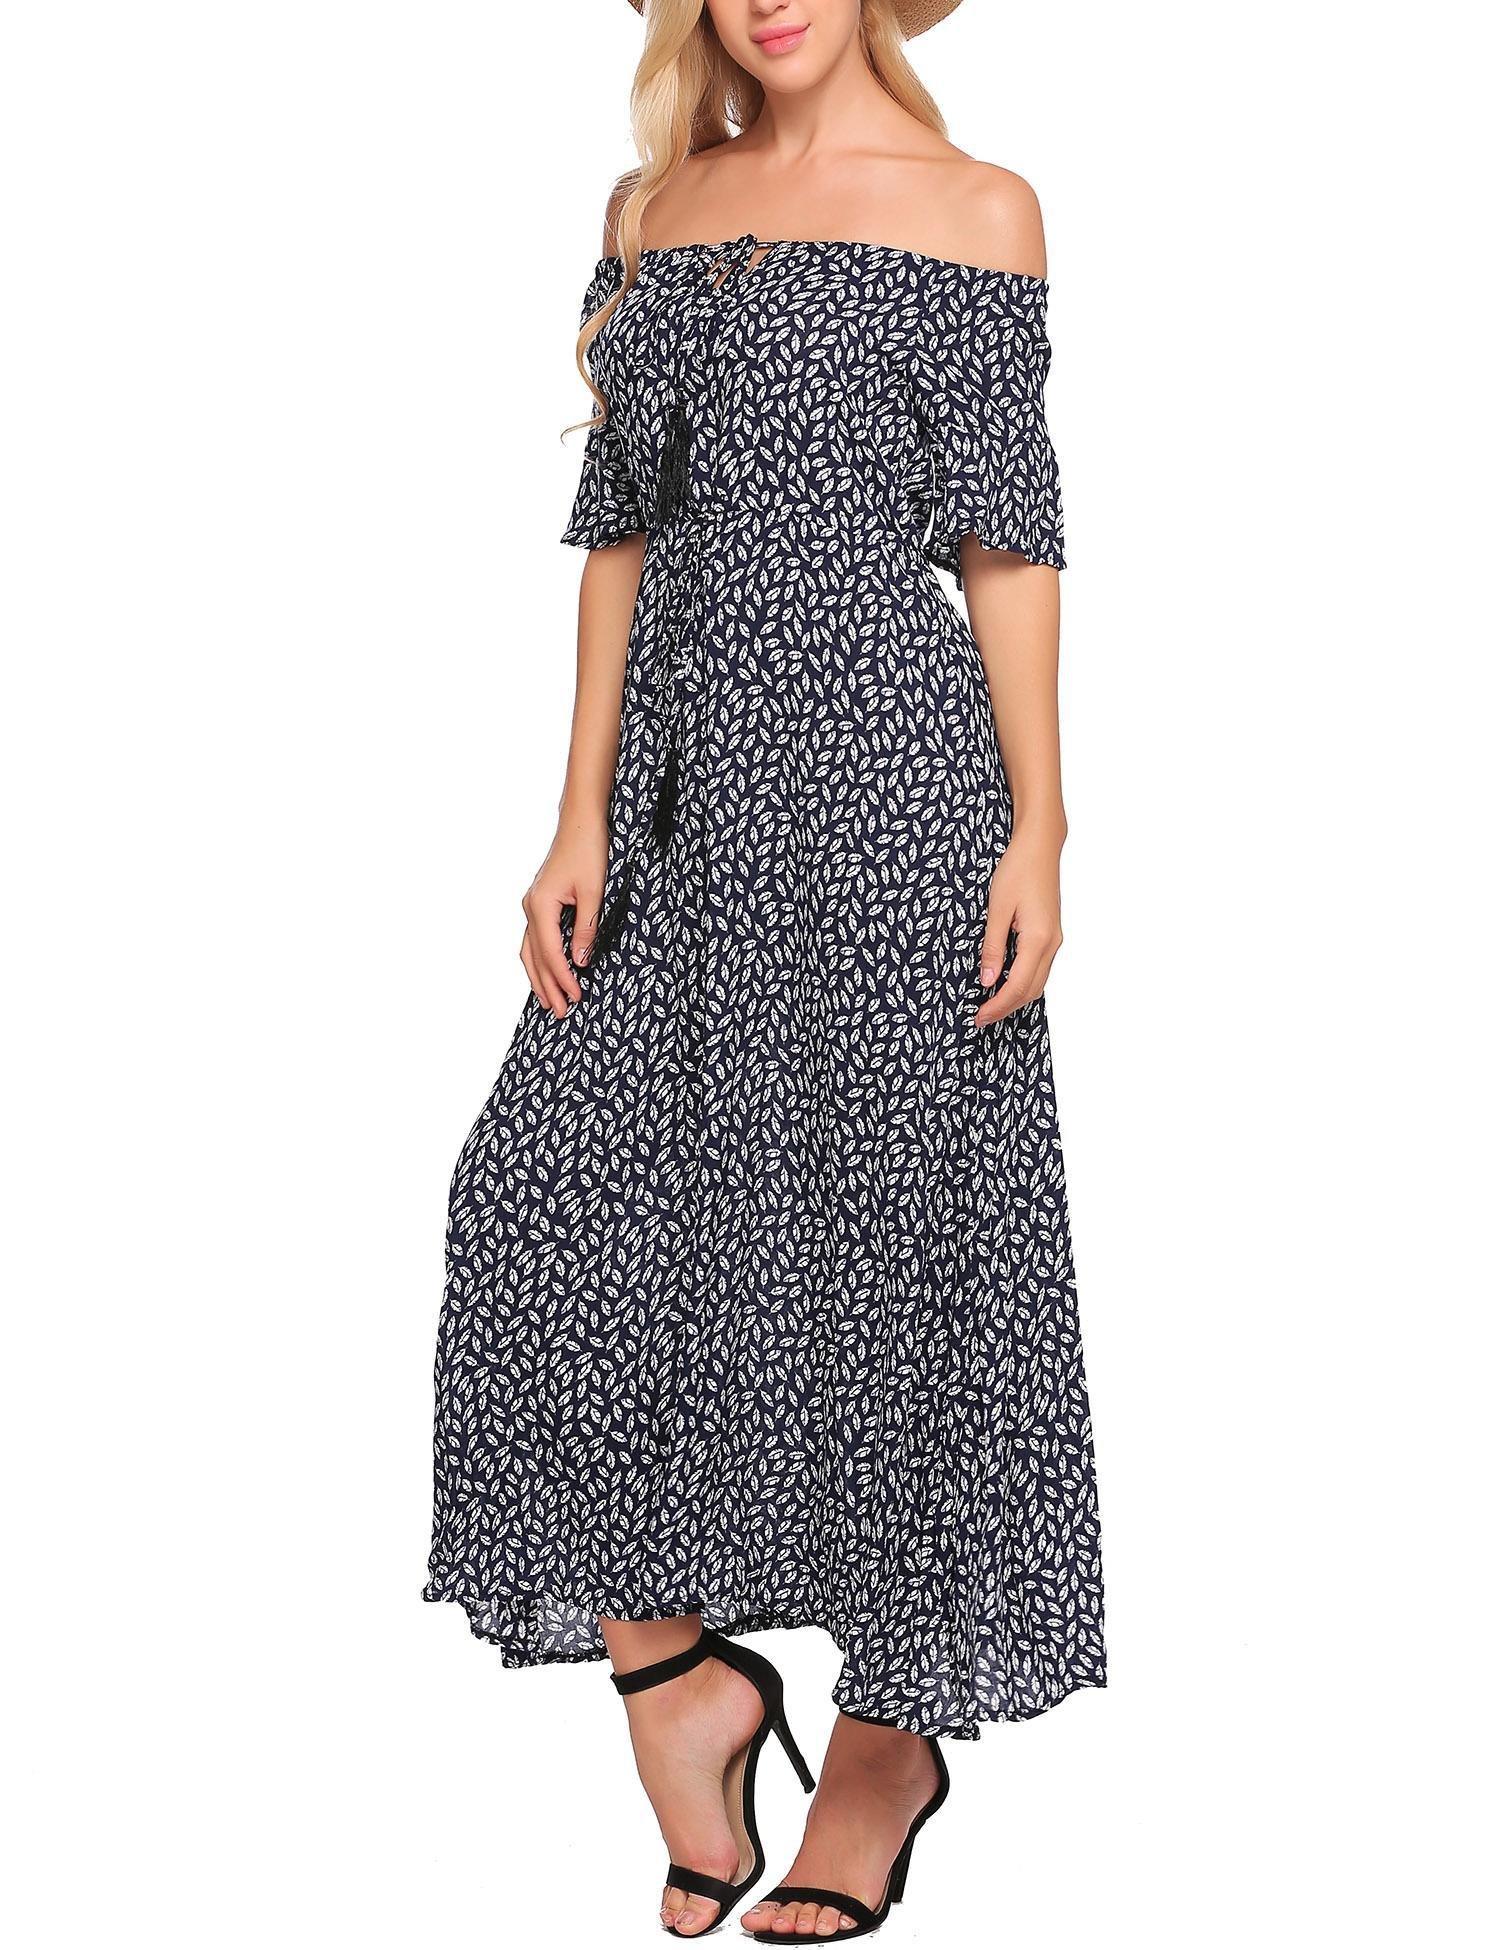 Zeagoo Women Boho Off the Shoulder Floral Print Casual Swing Maxi Dress Navy blue S